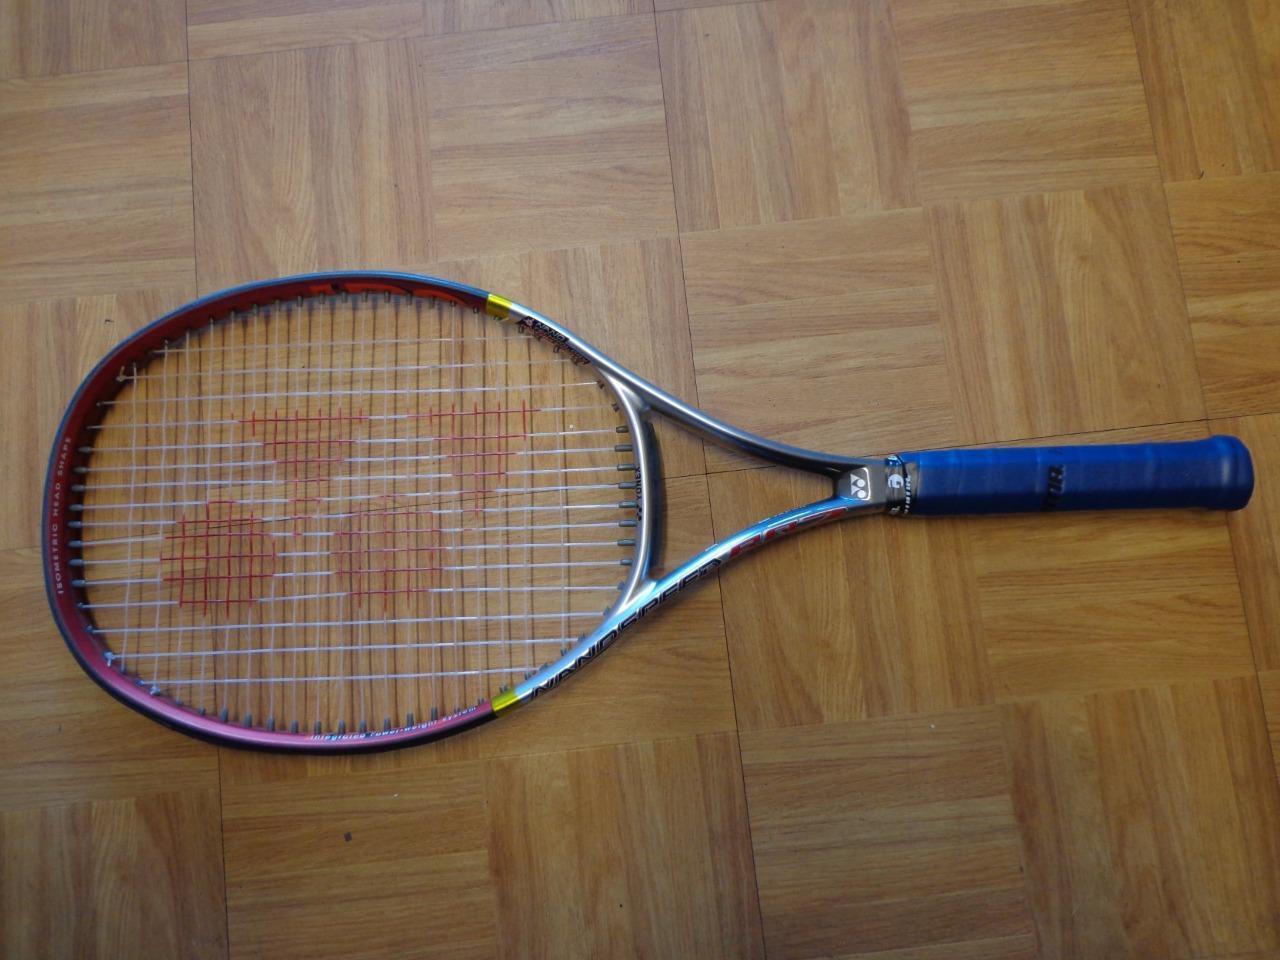 YONEX nanospeed RQ 7 110 headTaille 4 5 8 grip raquette de tennis